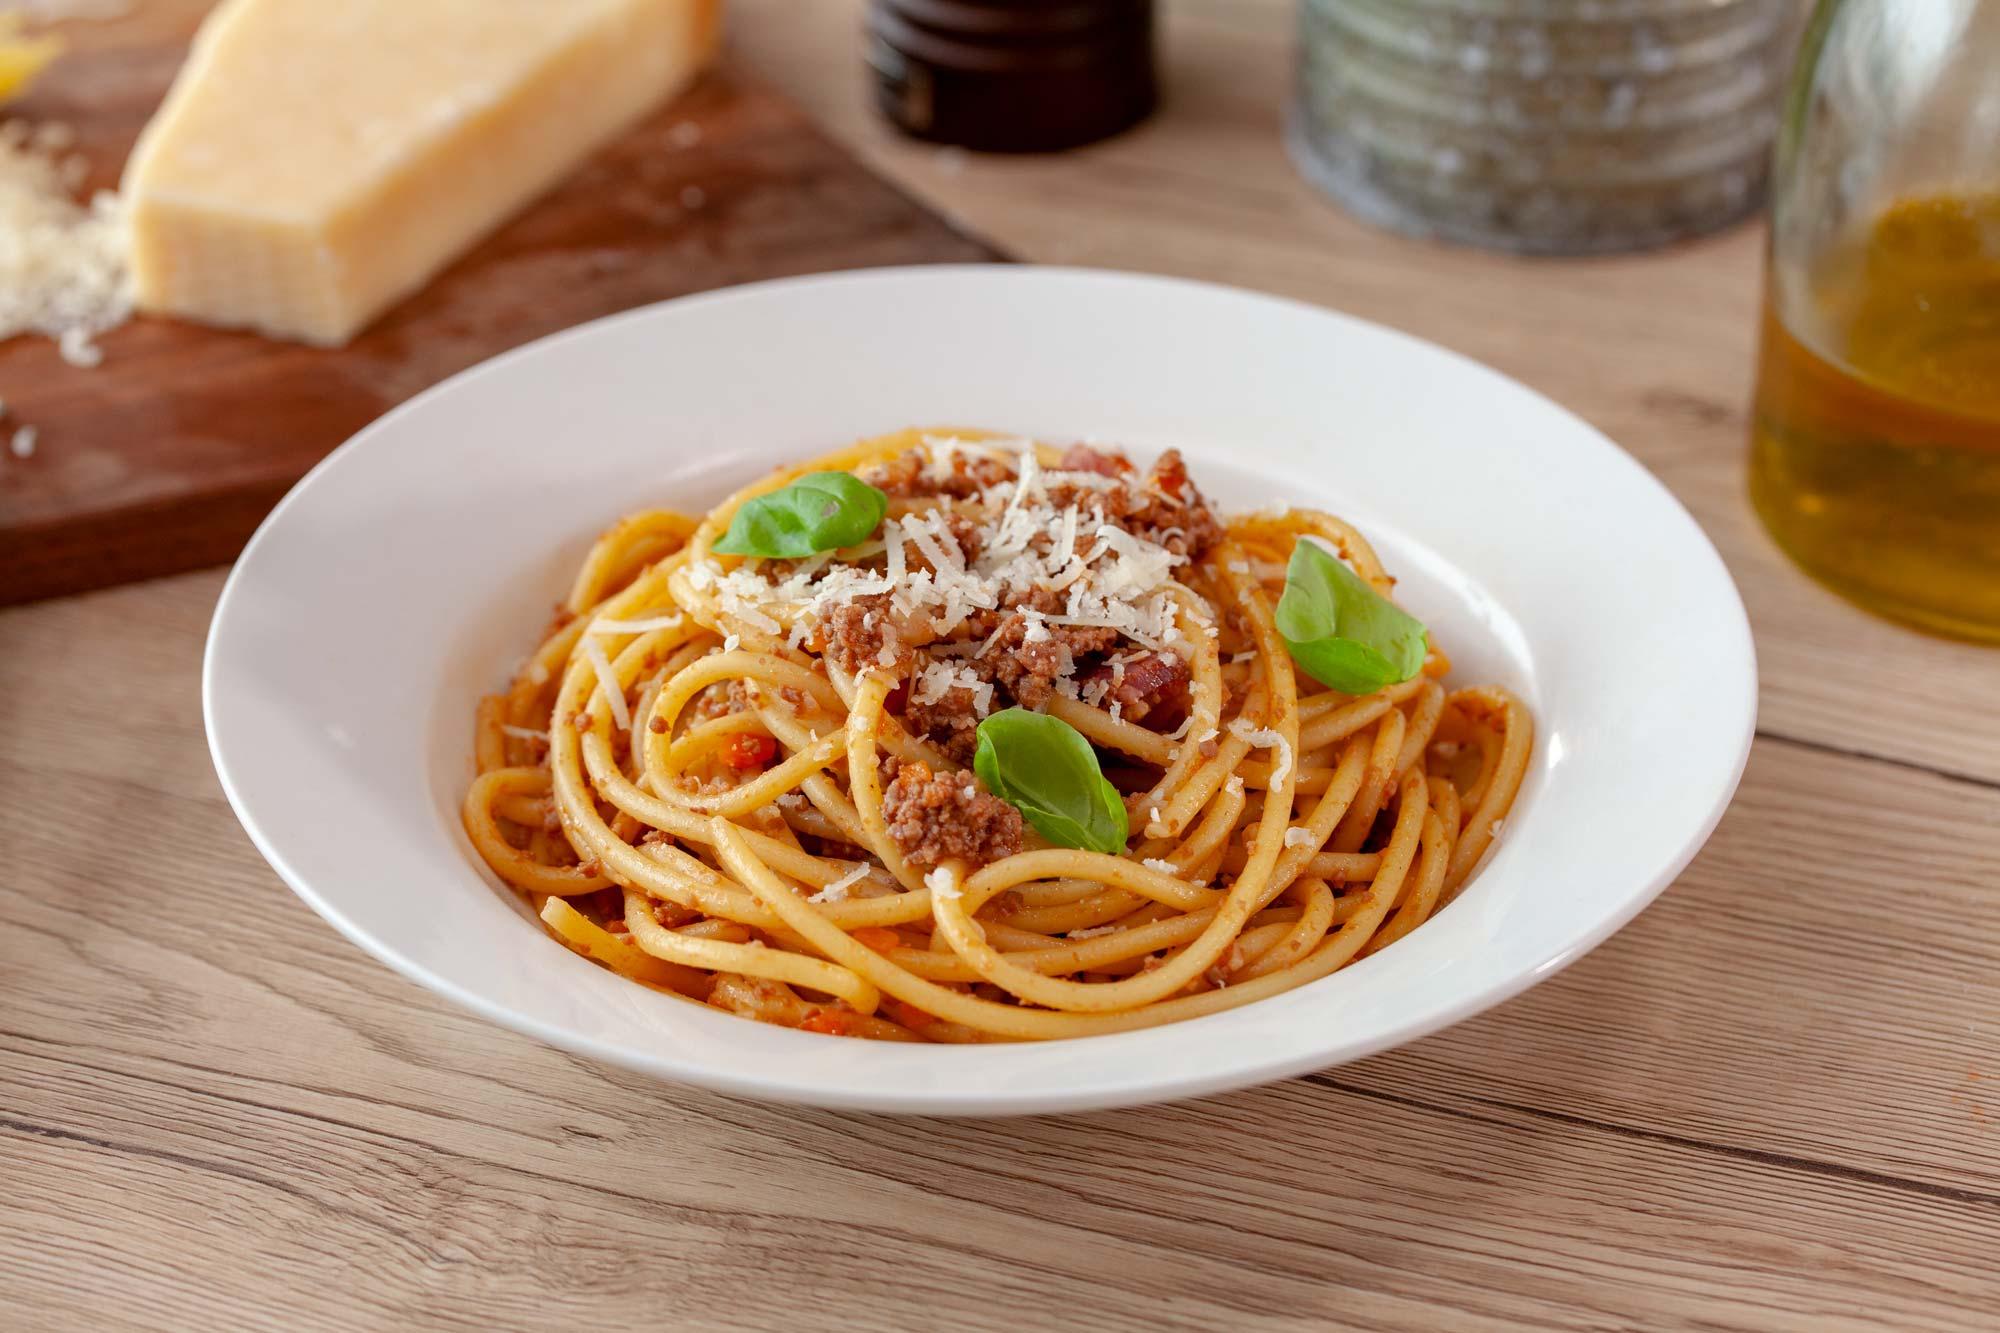 Domača bolonjska omaka